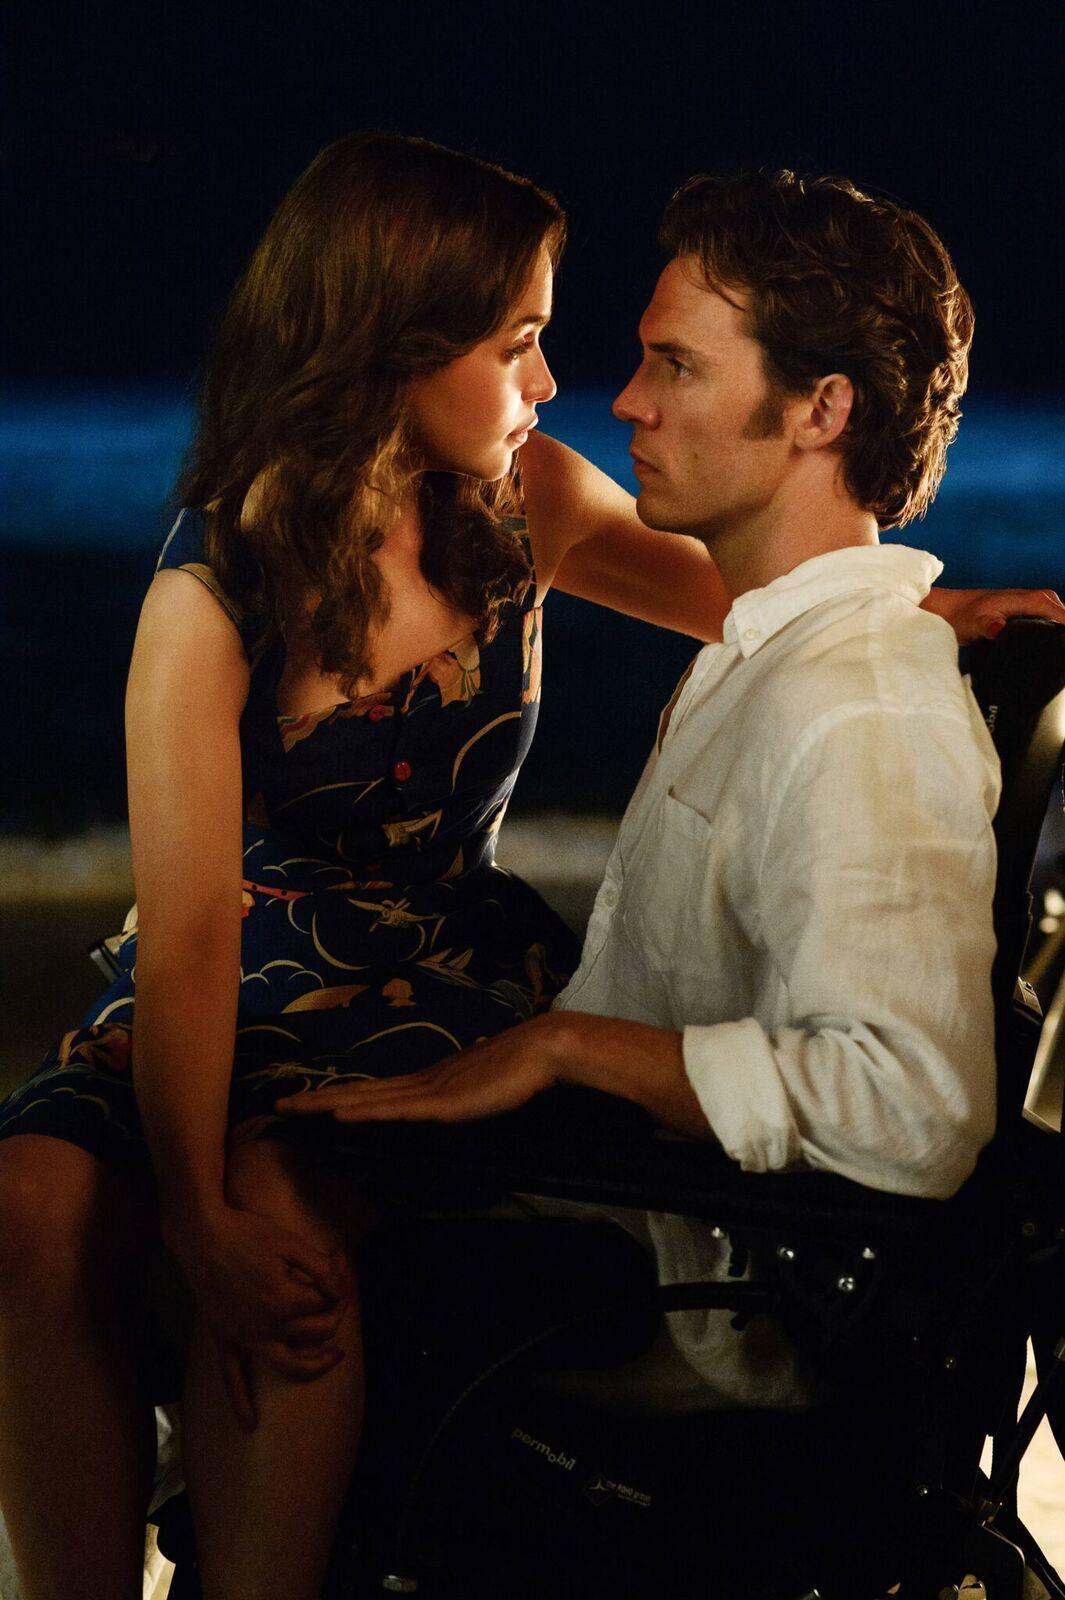 Me before You, Trước ngày em đến, Emilia Clarke, Sam Claflin